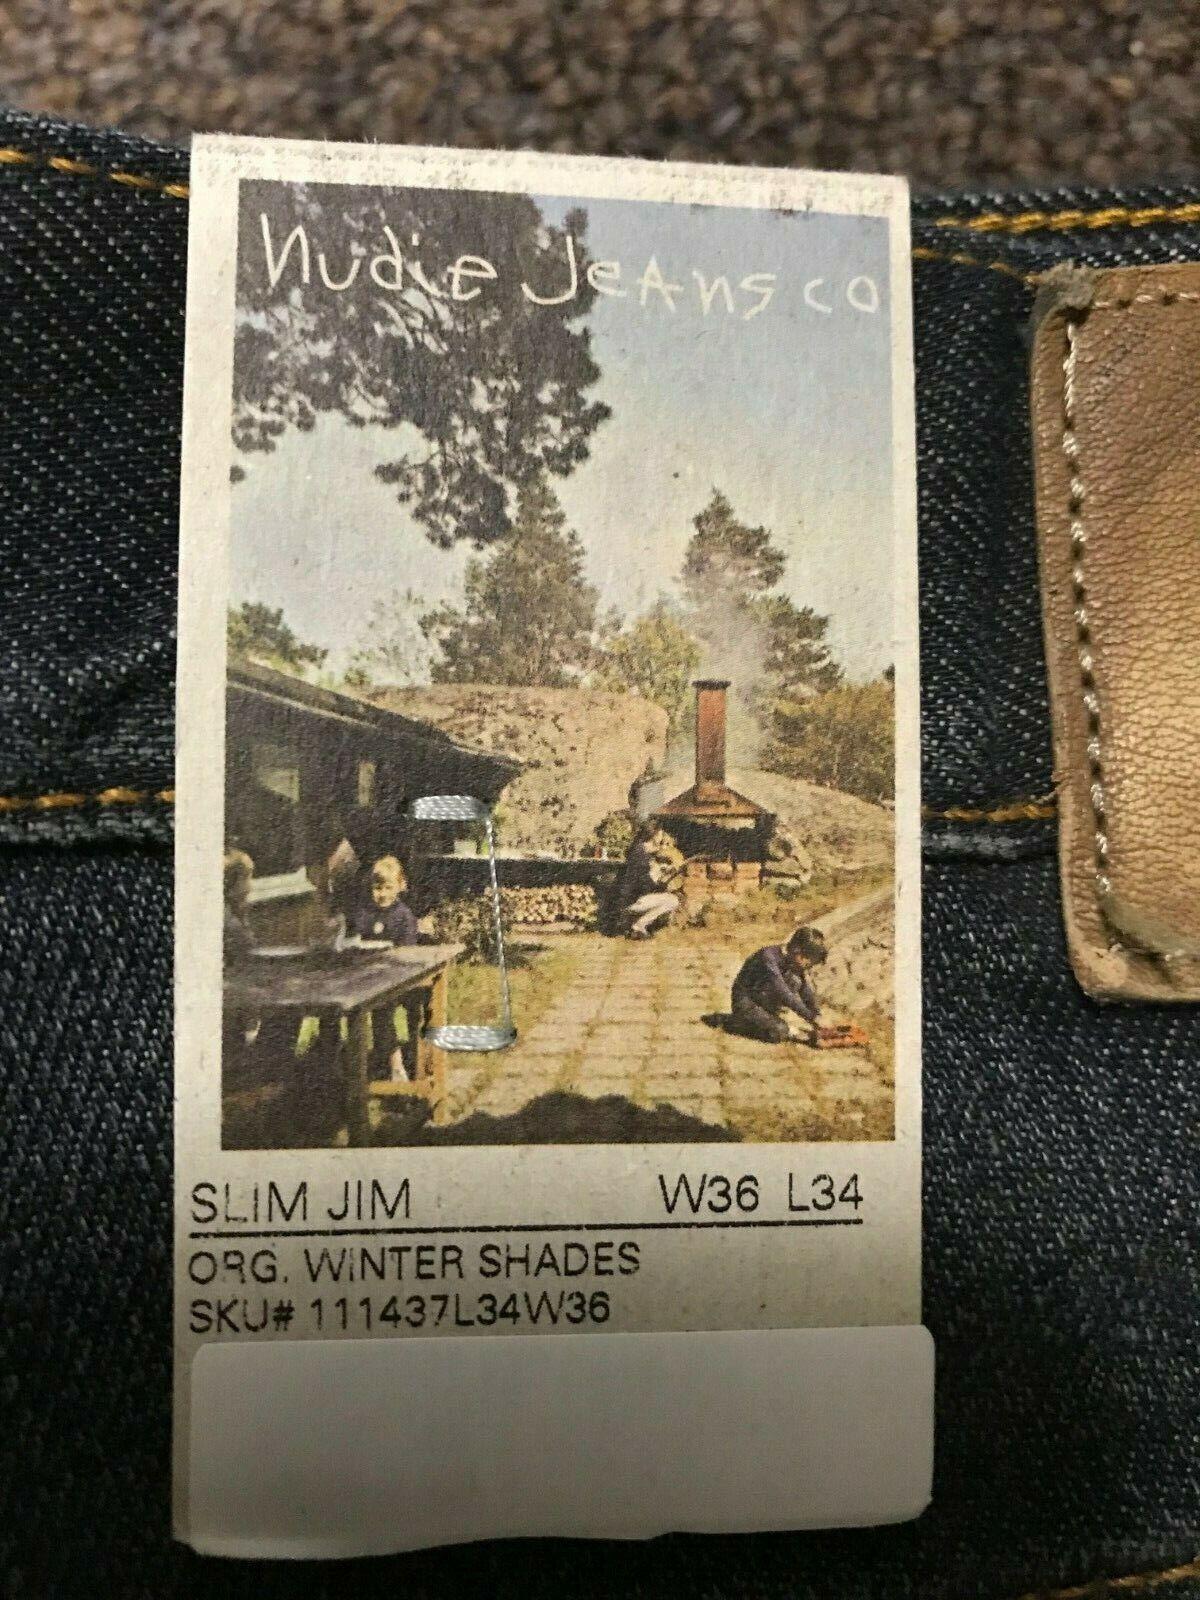 NUDIE JEANS SLIM JIM  WINTER SHADES BRAND NEW RETAIL